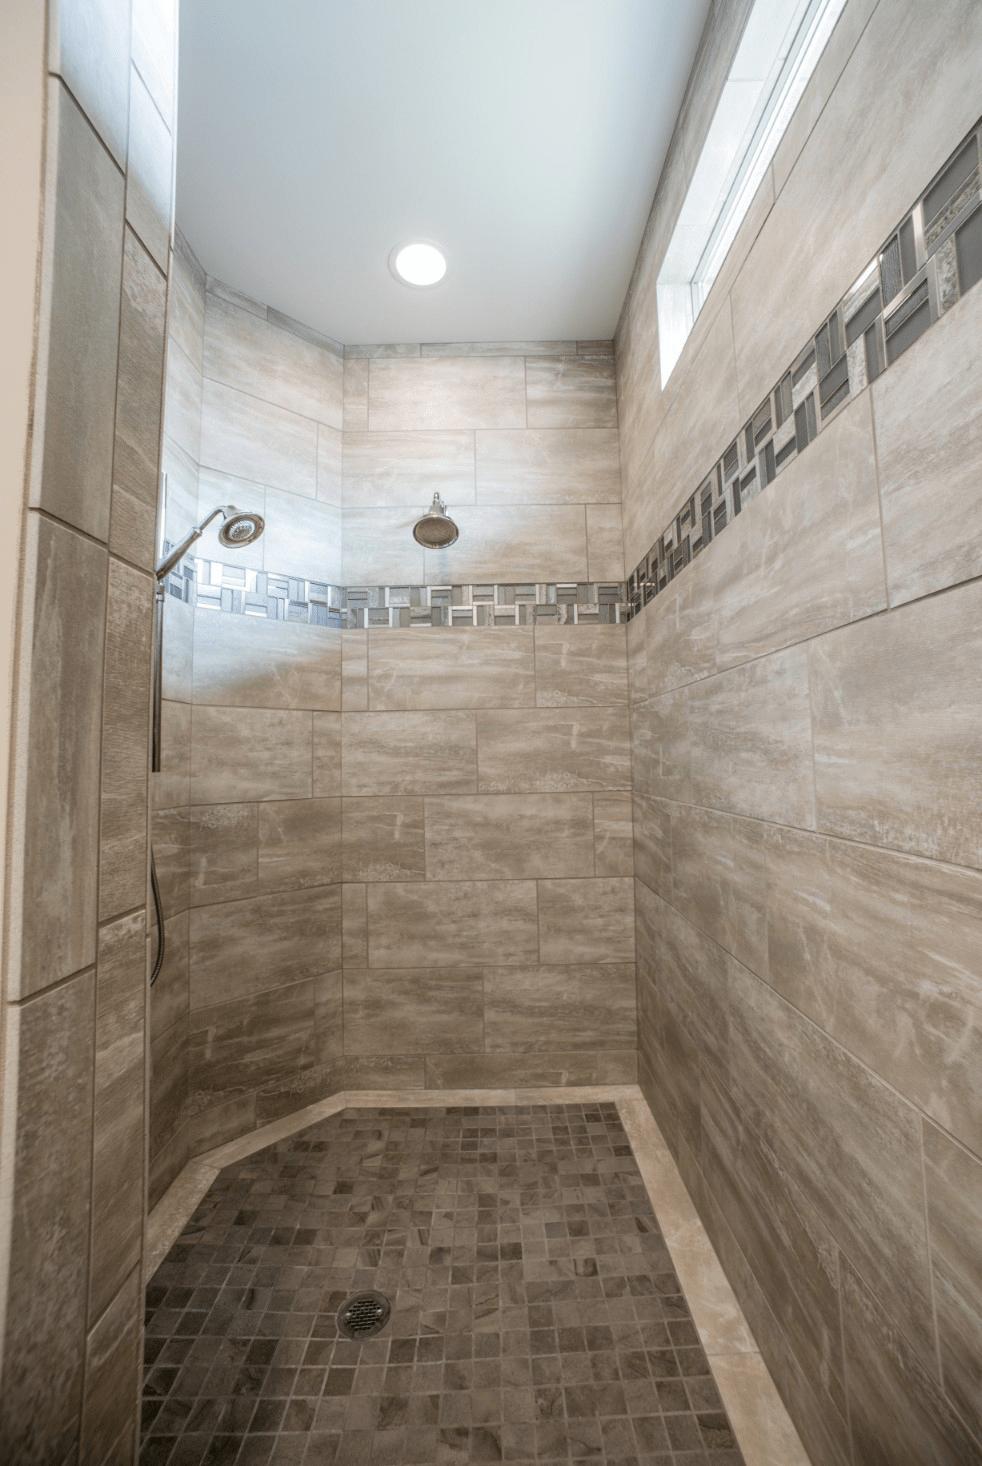 Bathroom wall designs | Johnston Paint & Decorating